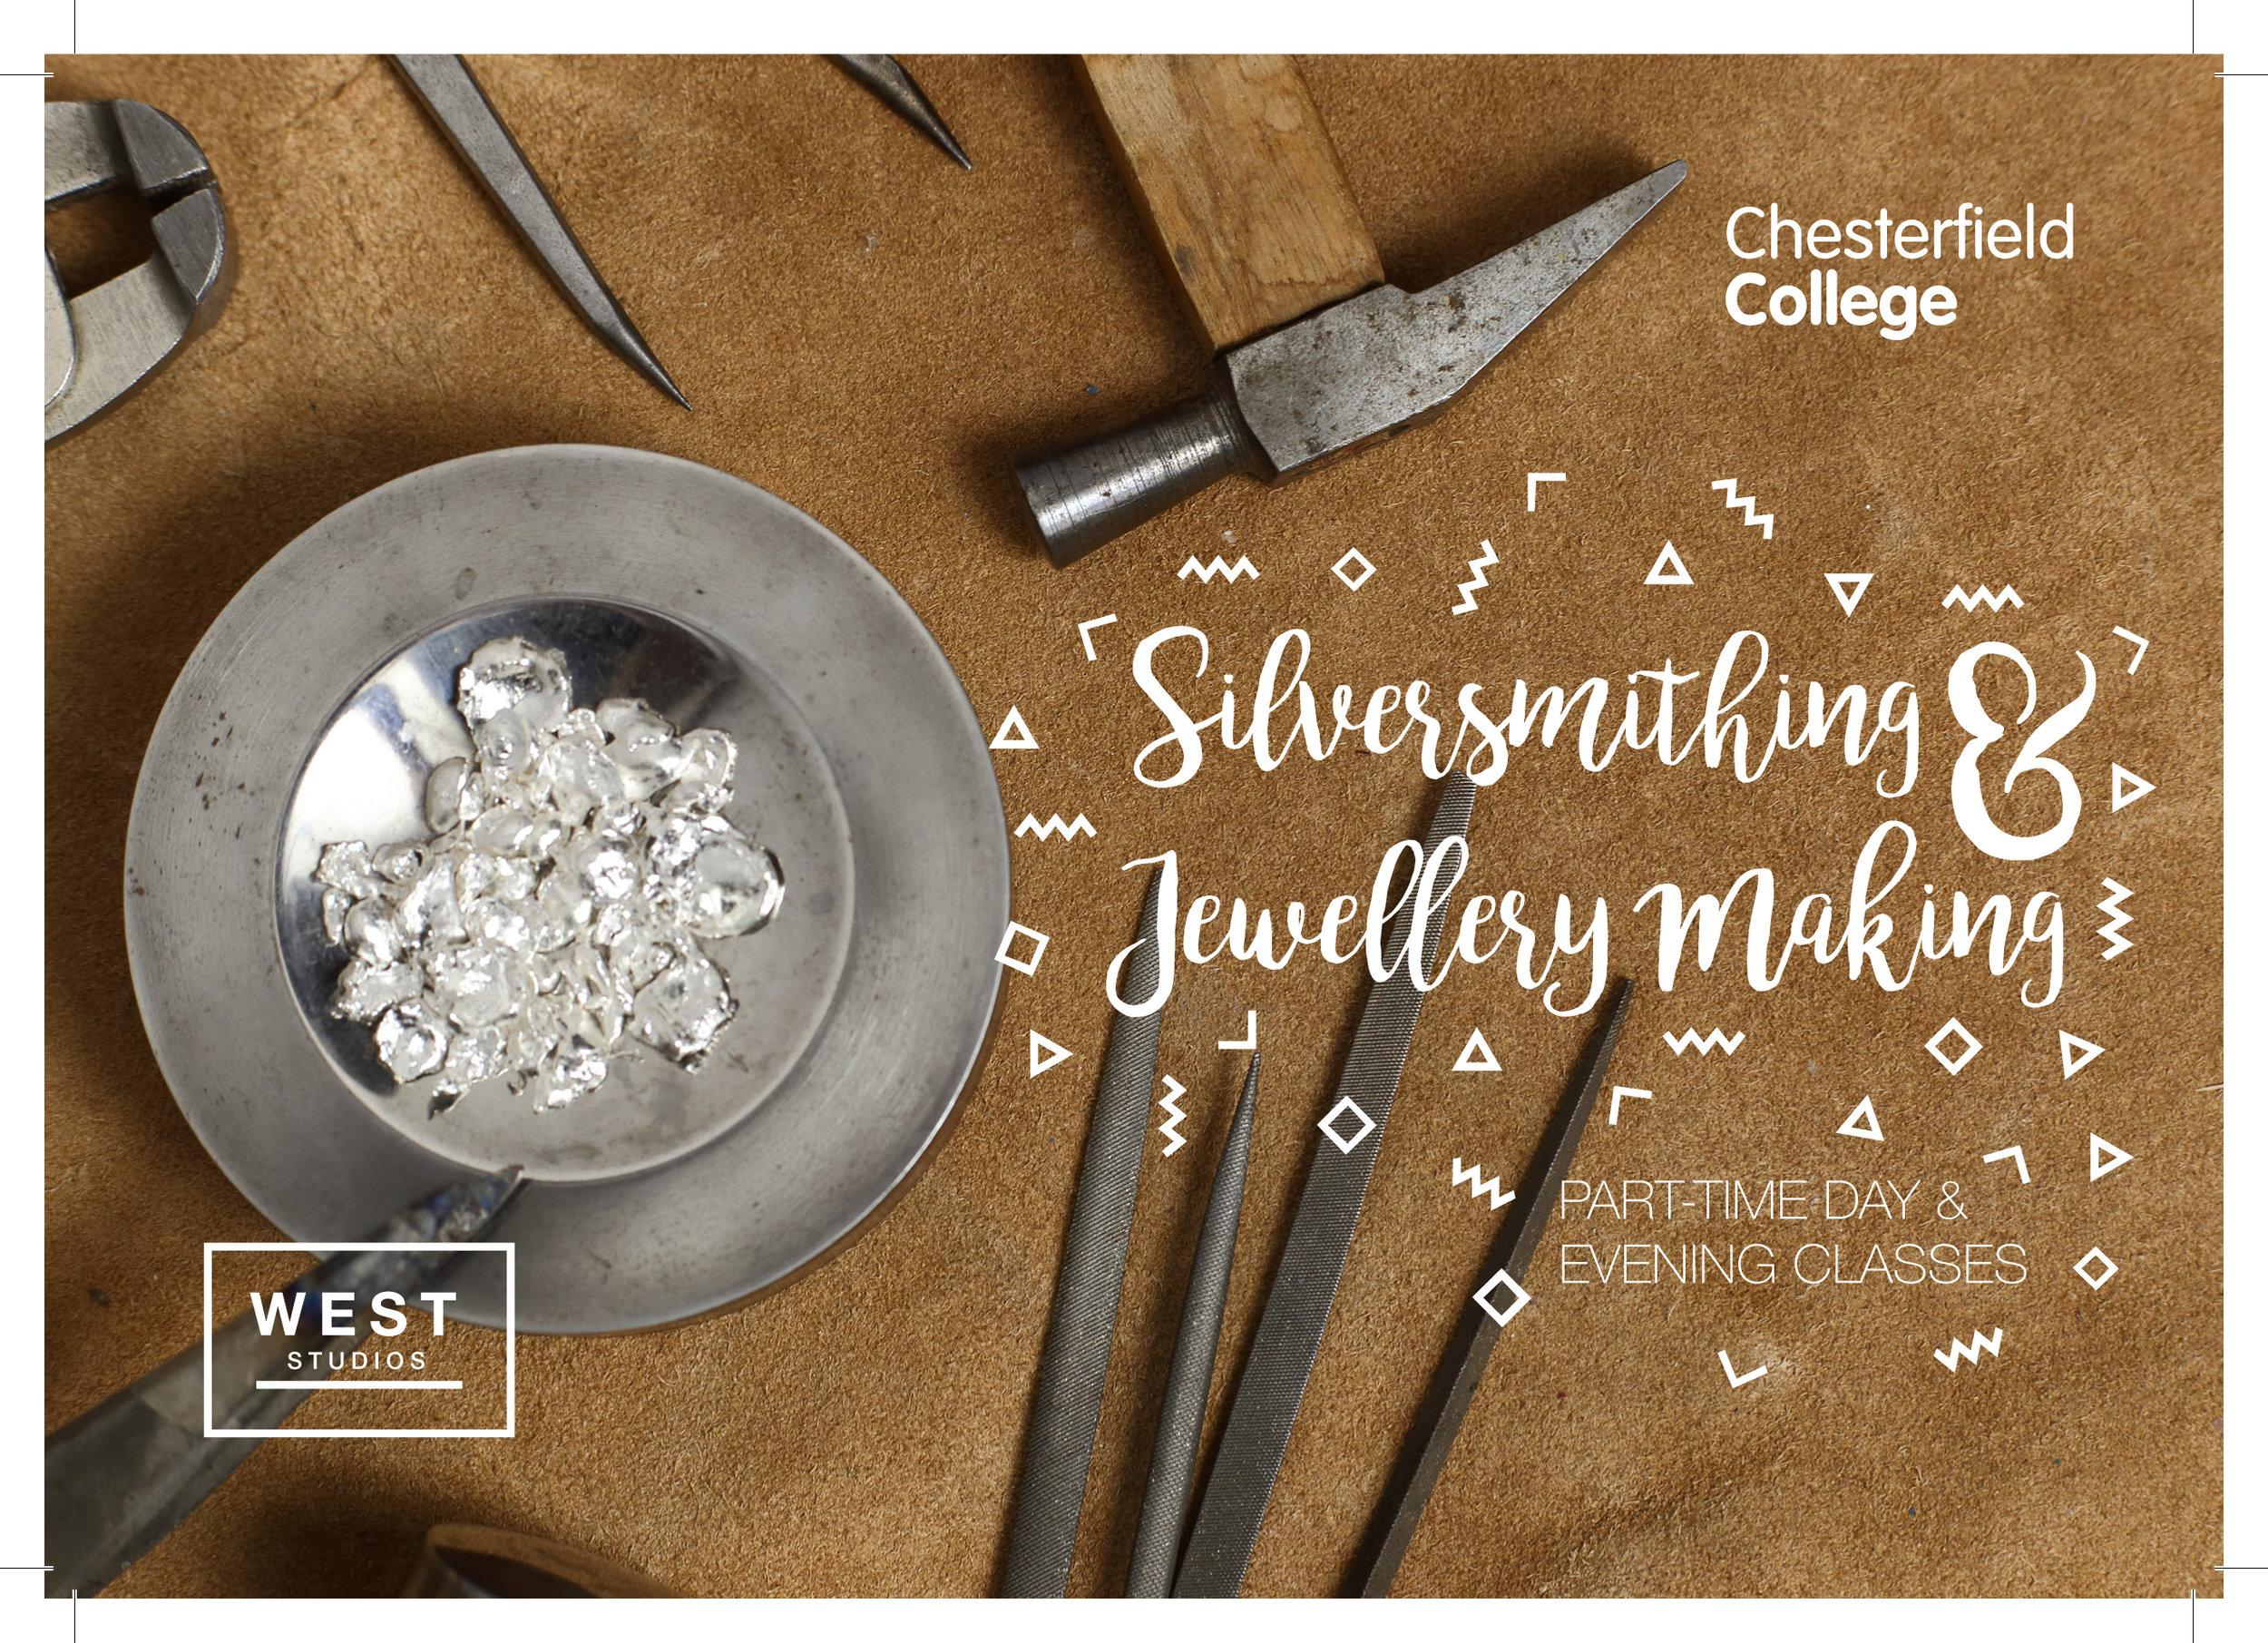 Silversmithing Course